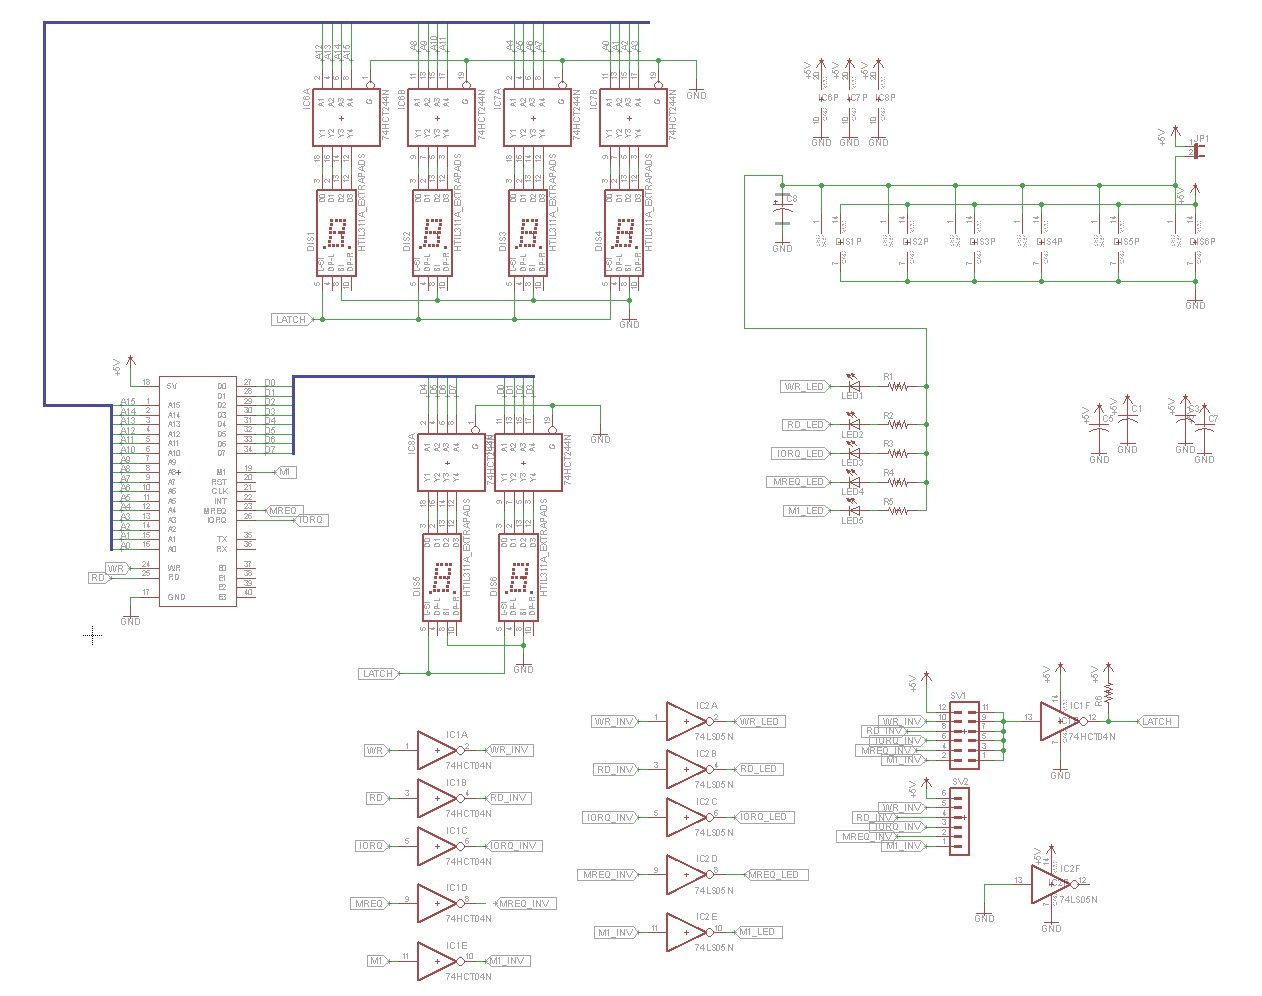 Z80 Retrocomputing 3 Bus Monitor Board